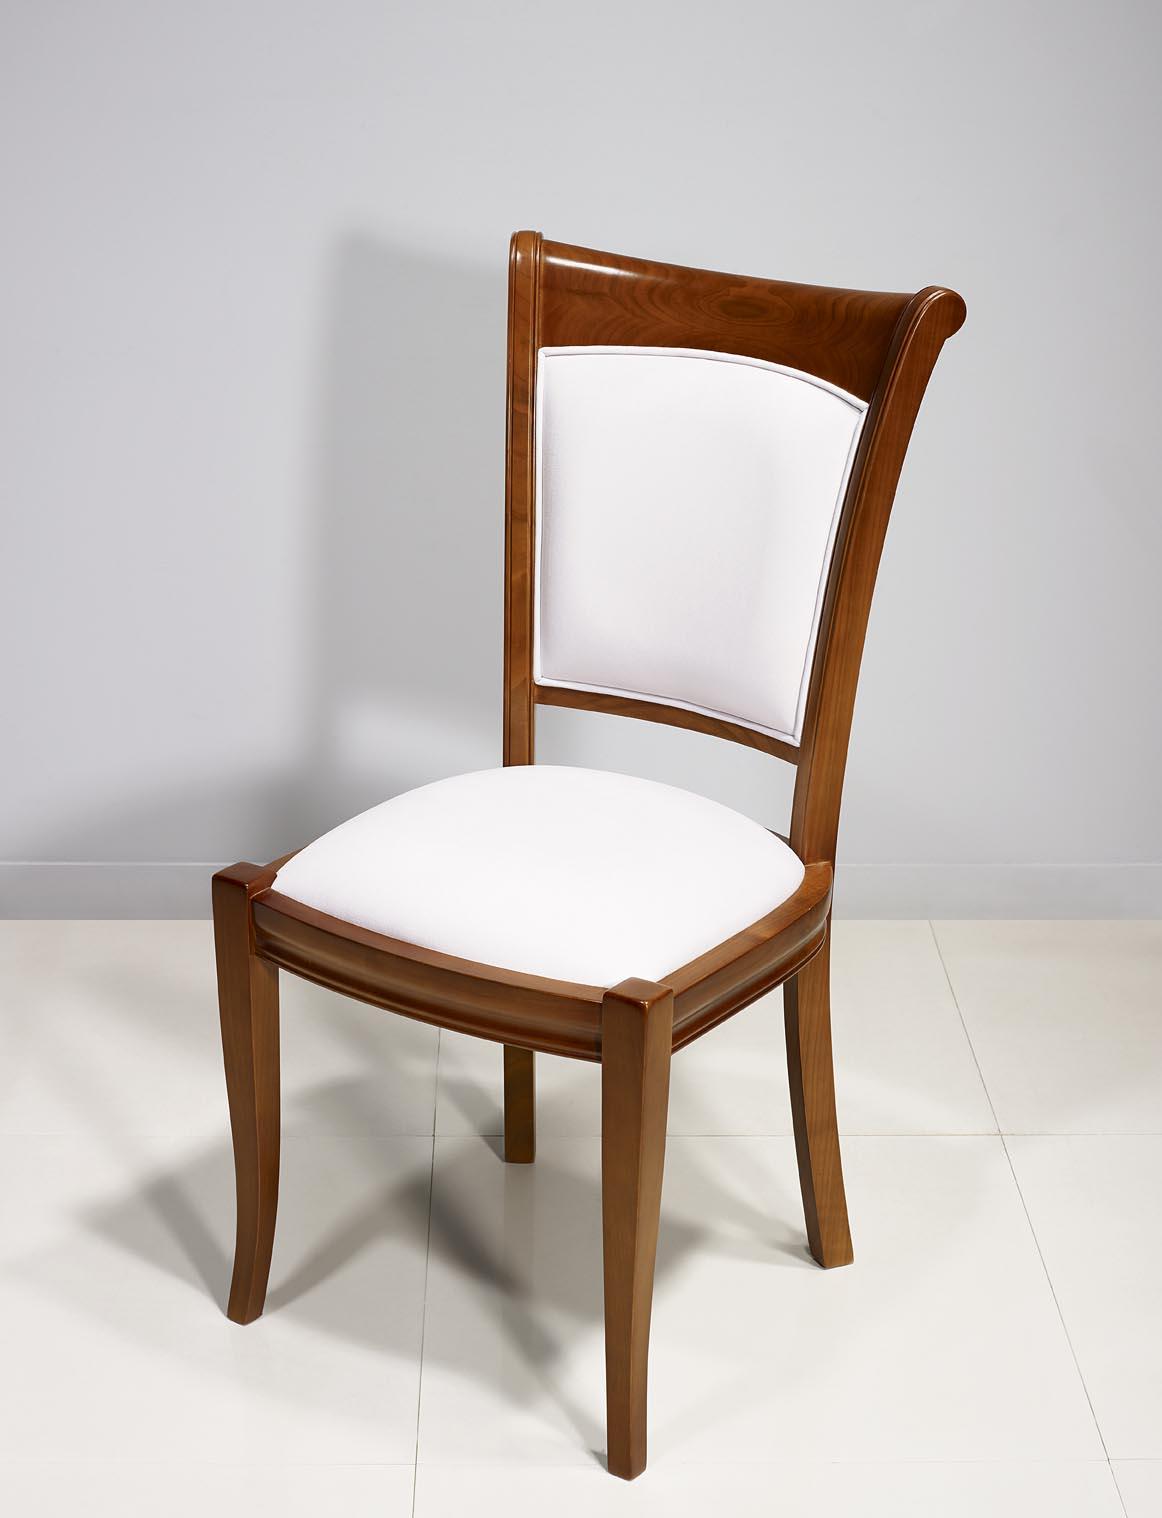 Chaise ine en Merisier Massif de style Louis Philippe Moleskine ELASTRON - OMEGA - CREAM